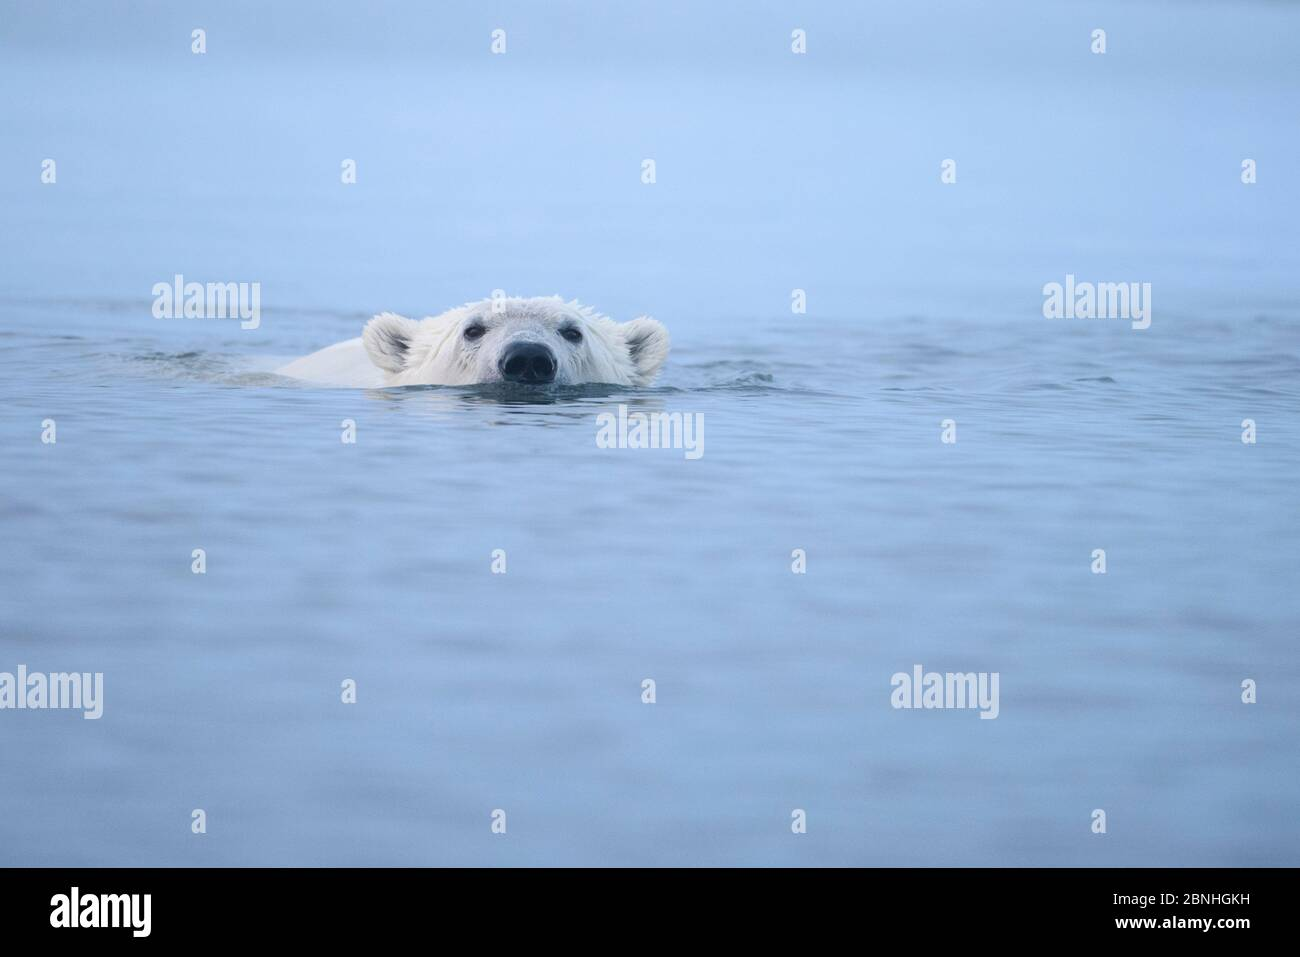 Polar bear (Ursus maritimus) swimming at surface of Beaufort Sea, Alaska, USA Stock Photo